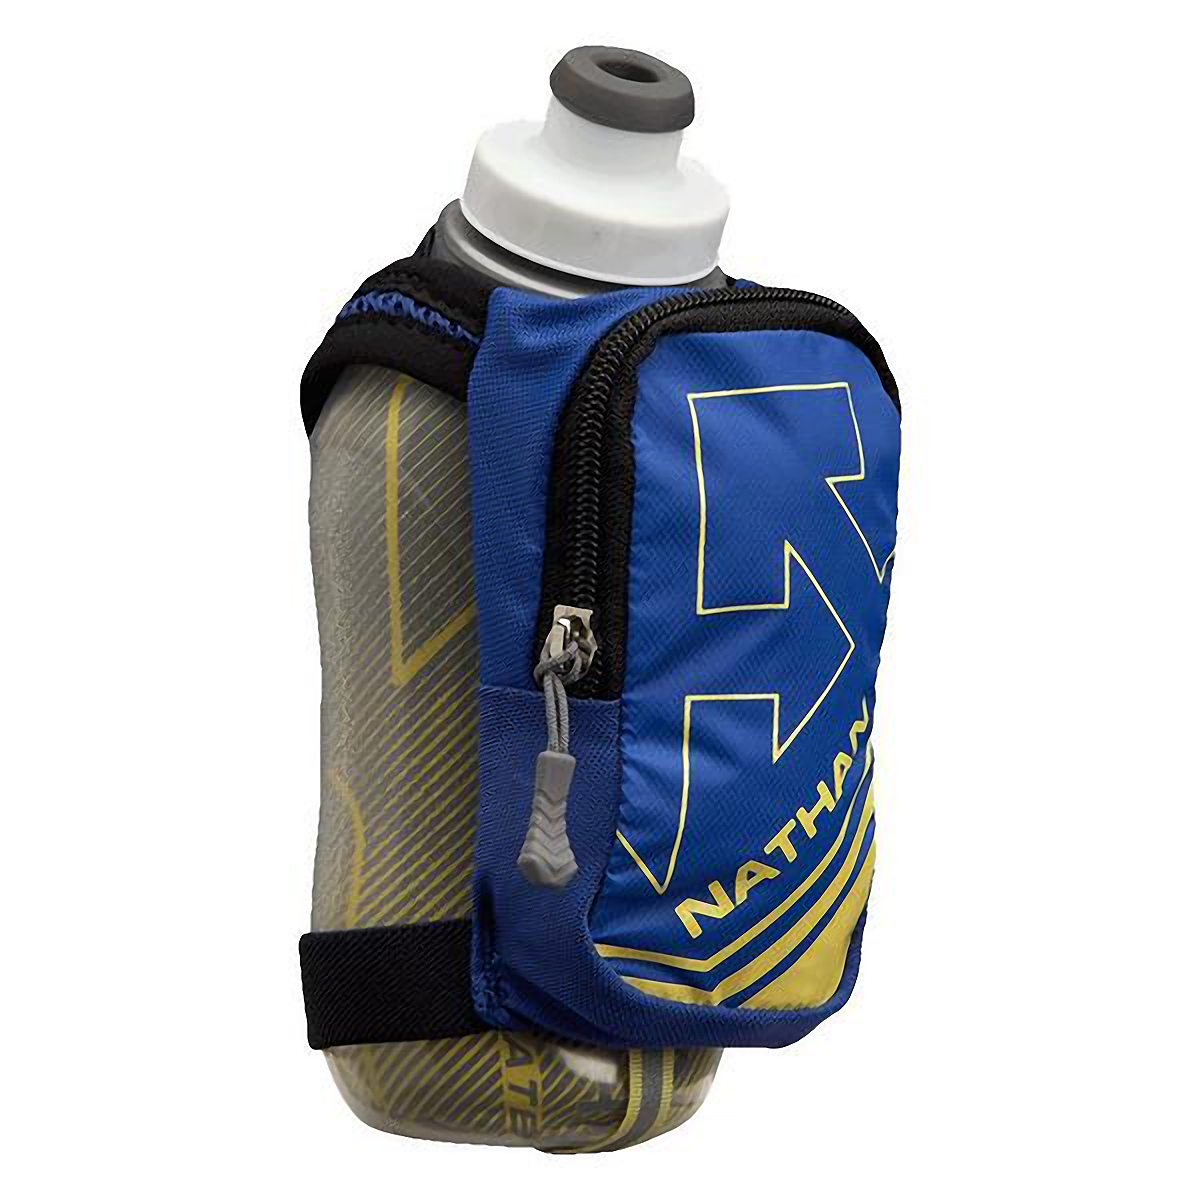 Nathan Speedshot Plus Insulated Flask - Color: Deep Ultramarine/Limelight - Size: One Size, Deep Ultramarine/Limelight, large, image 1